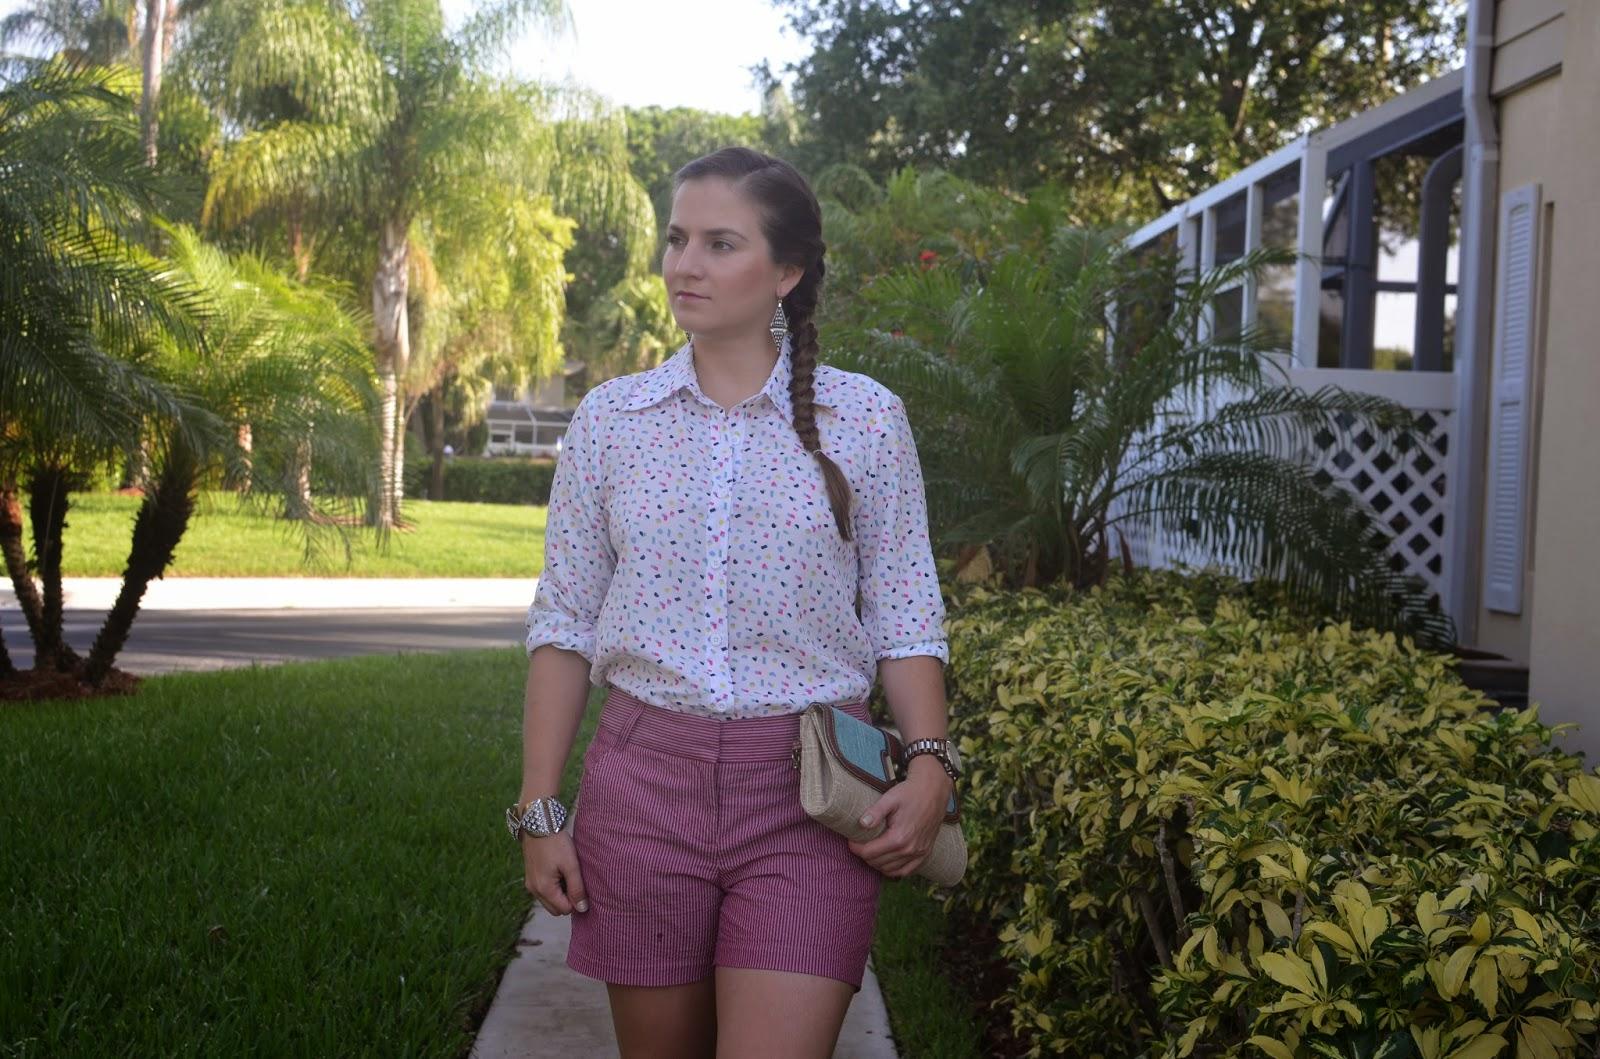 Seersucker shorts - #Emma_Sophia - backless top - straw clutch - espadrilles